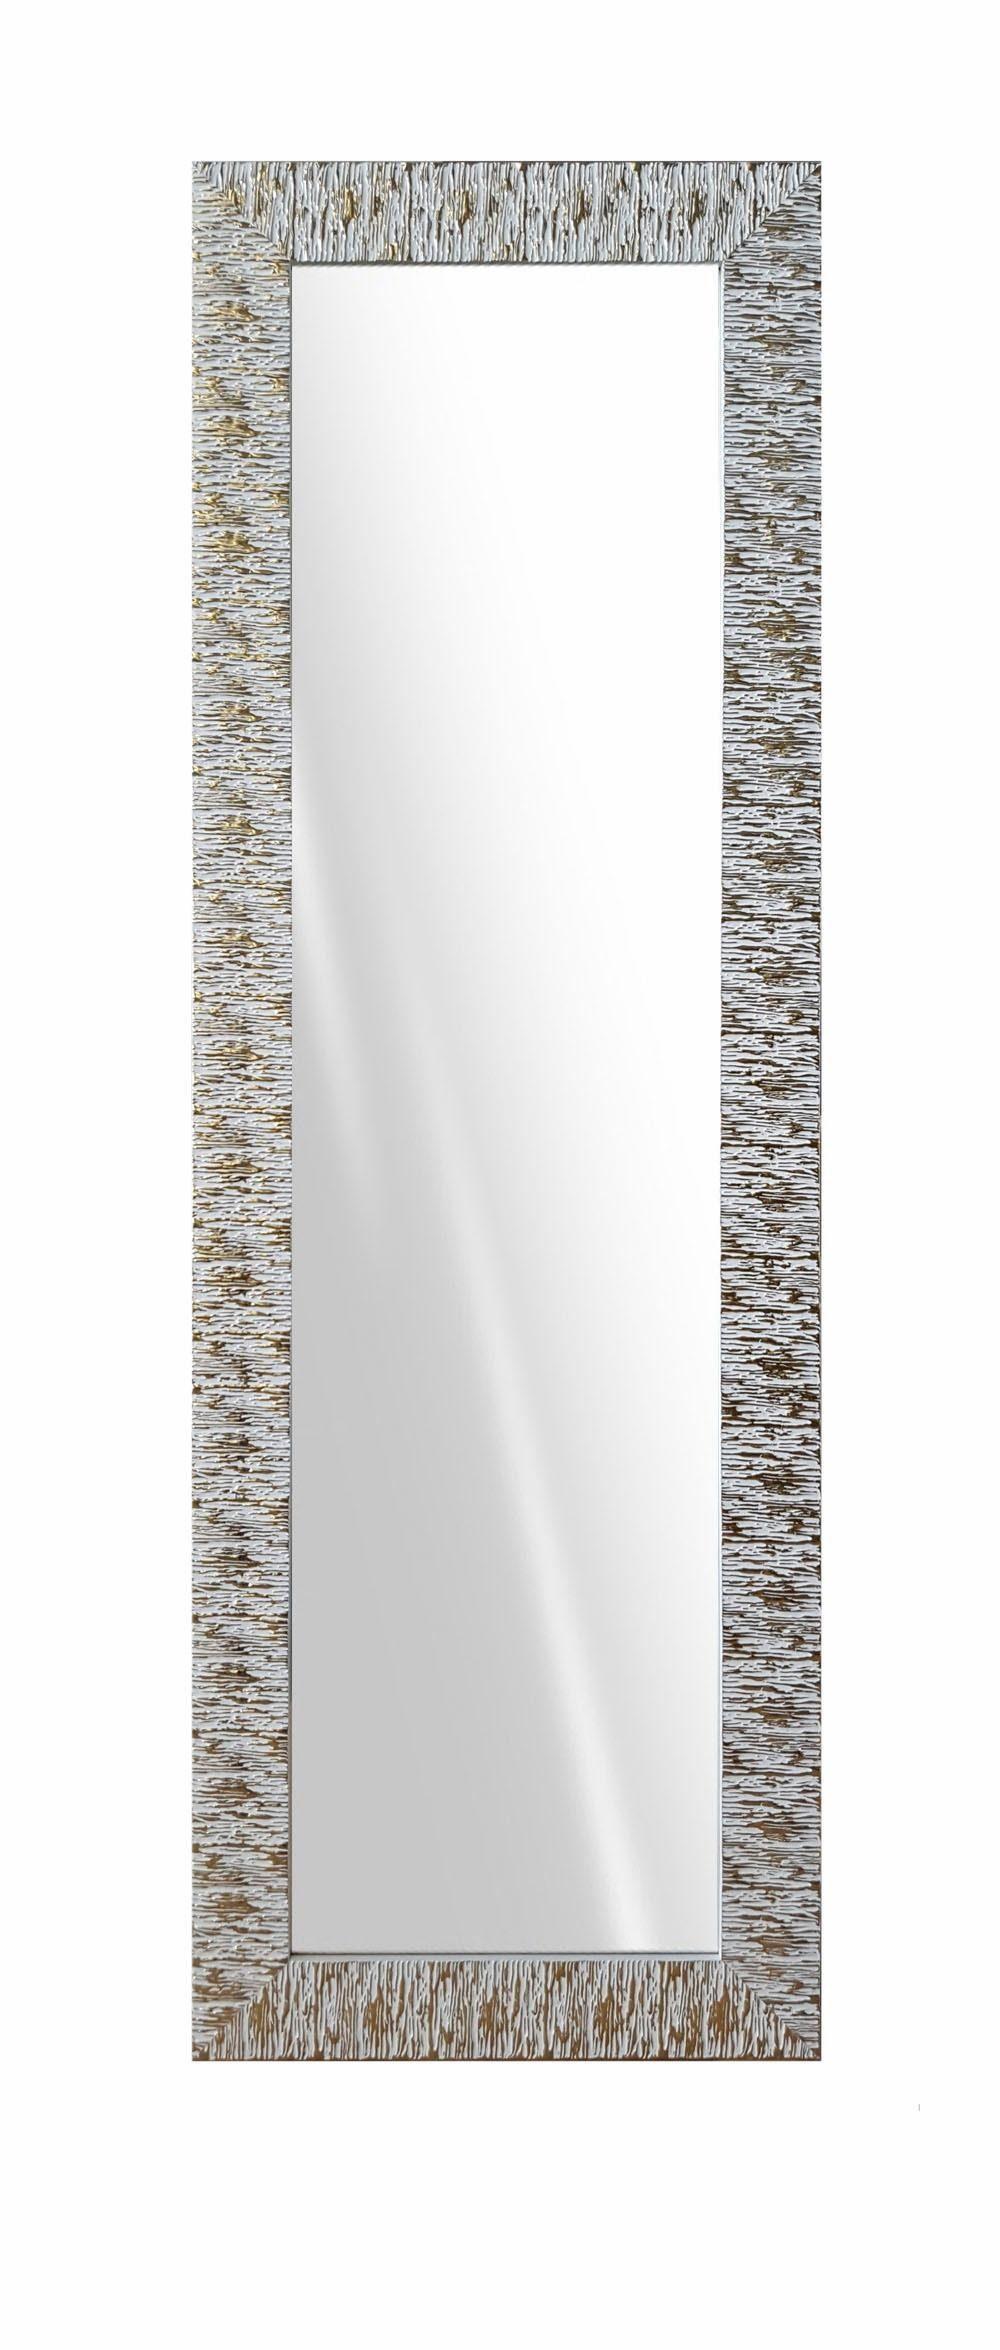 Home affaire Spiegel »Andriano« 54/154 cm